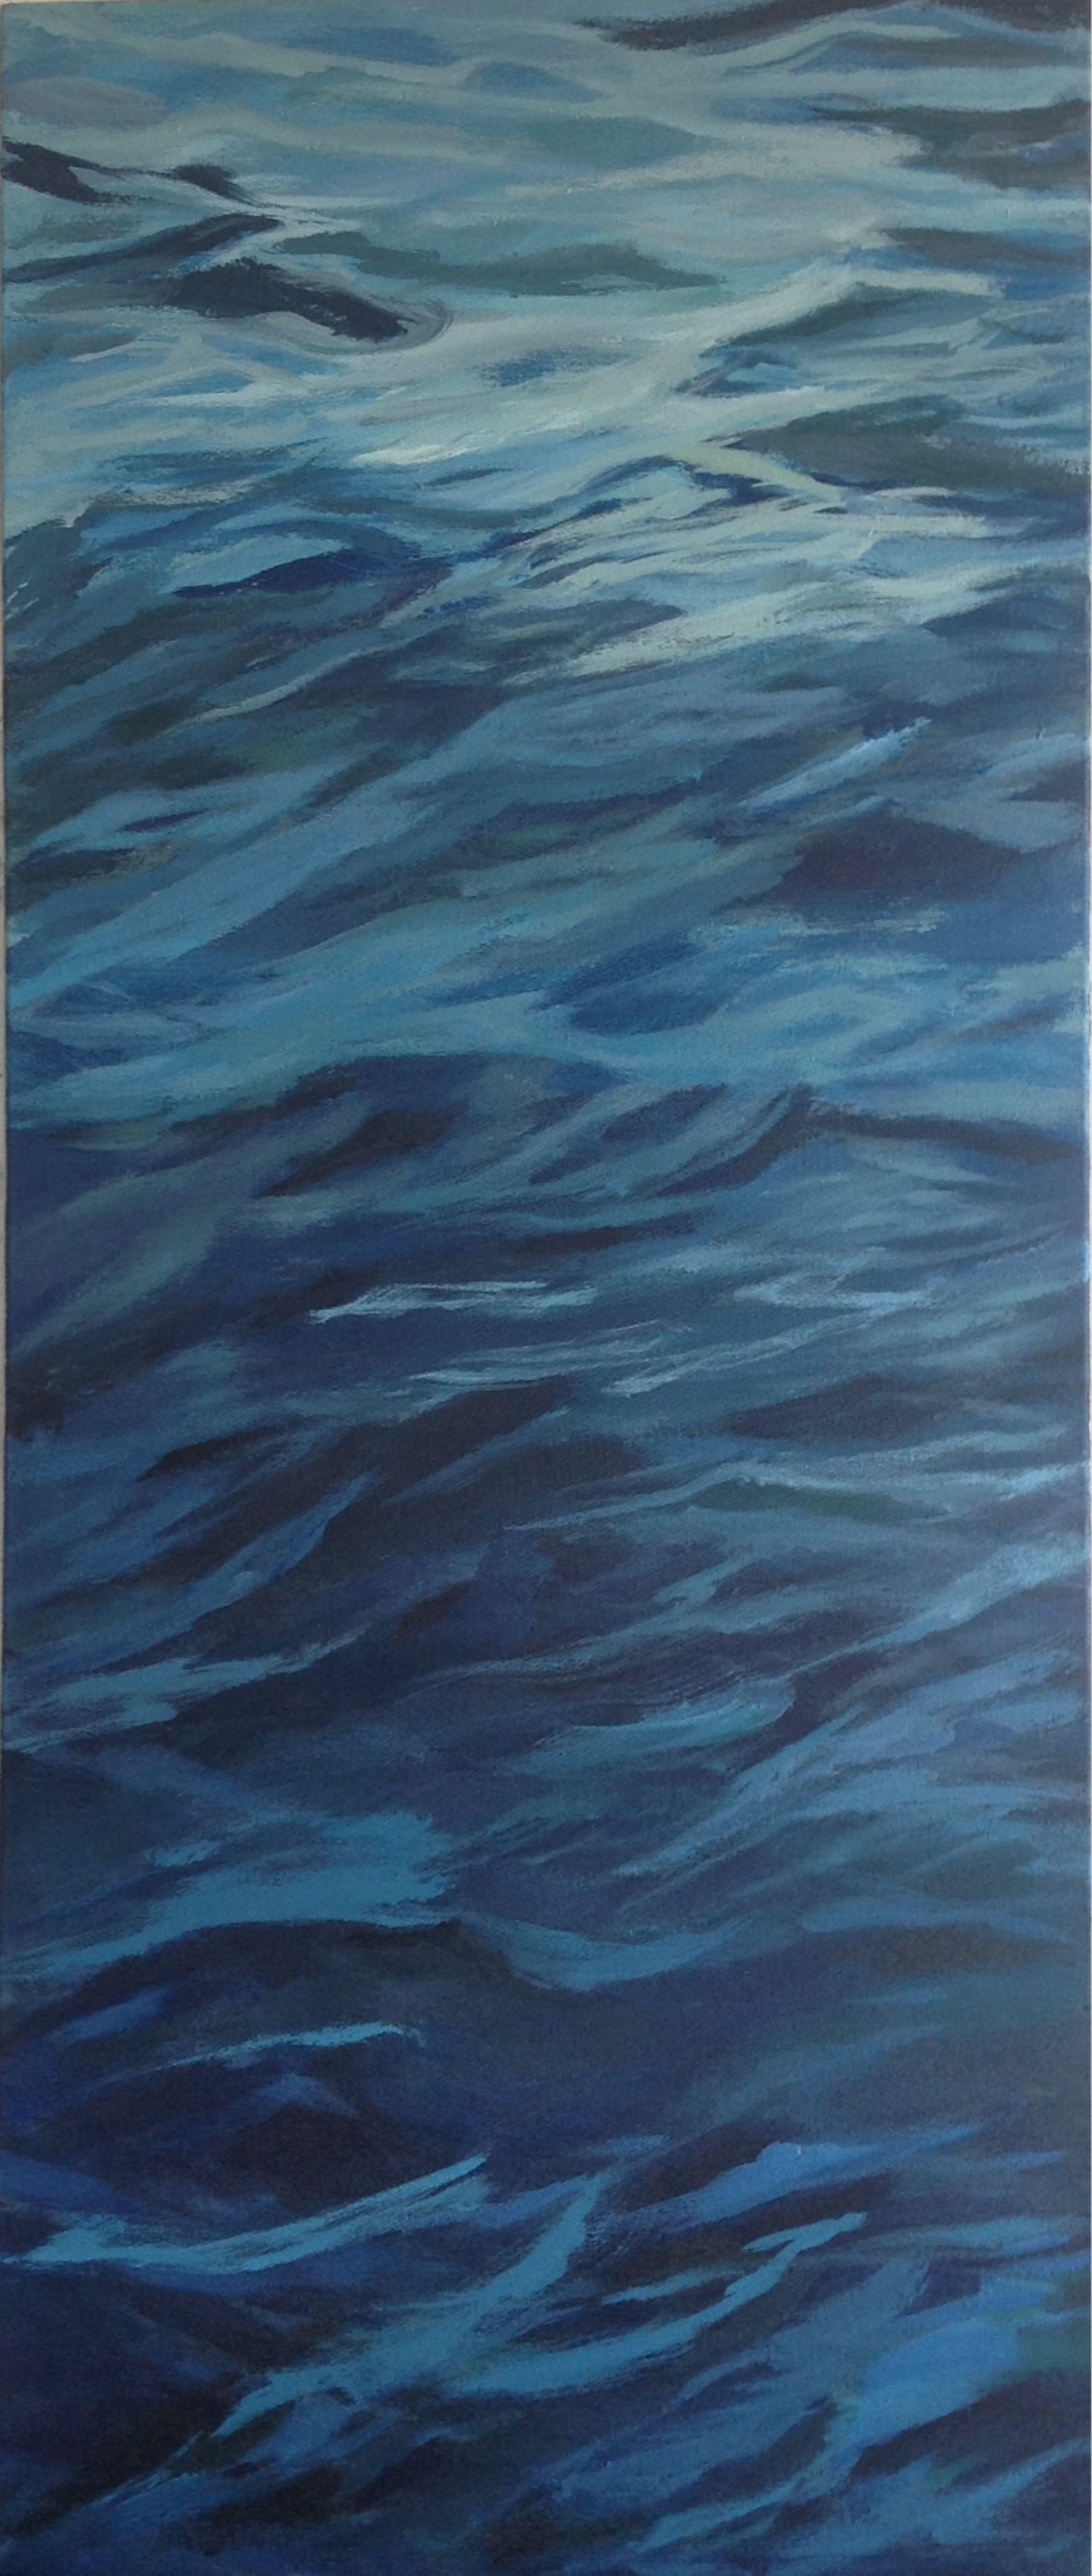 Sea, Painting, Acrylic on Canvas